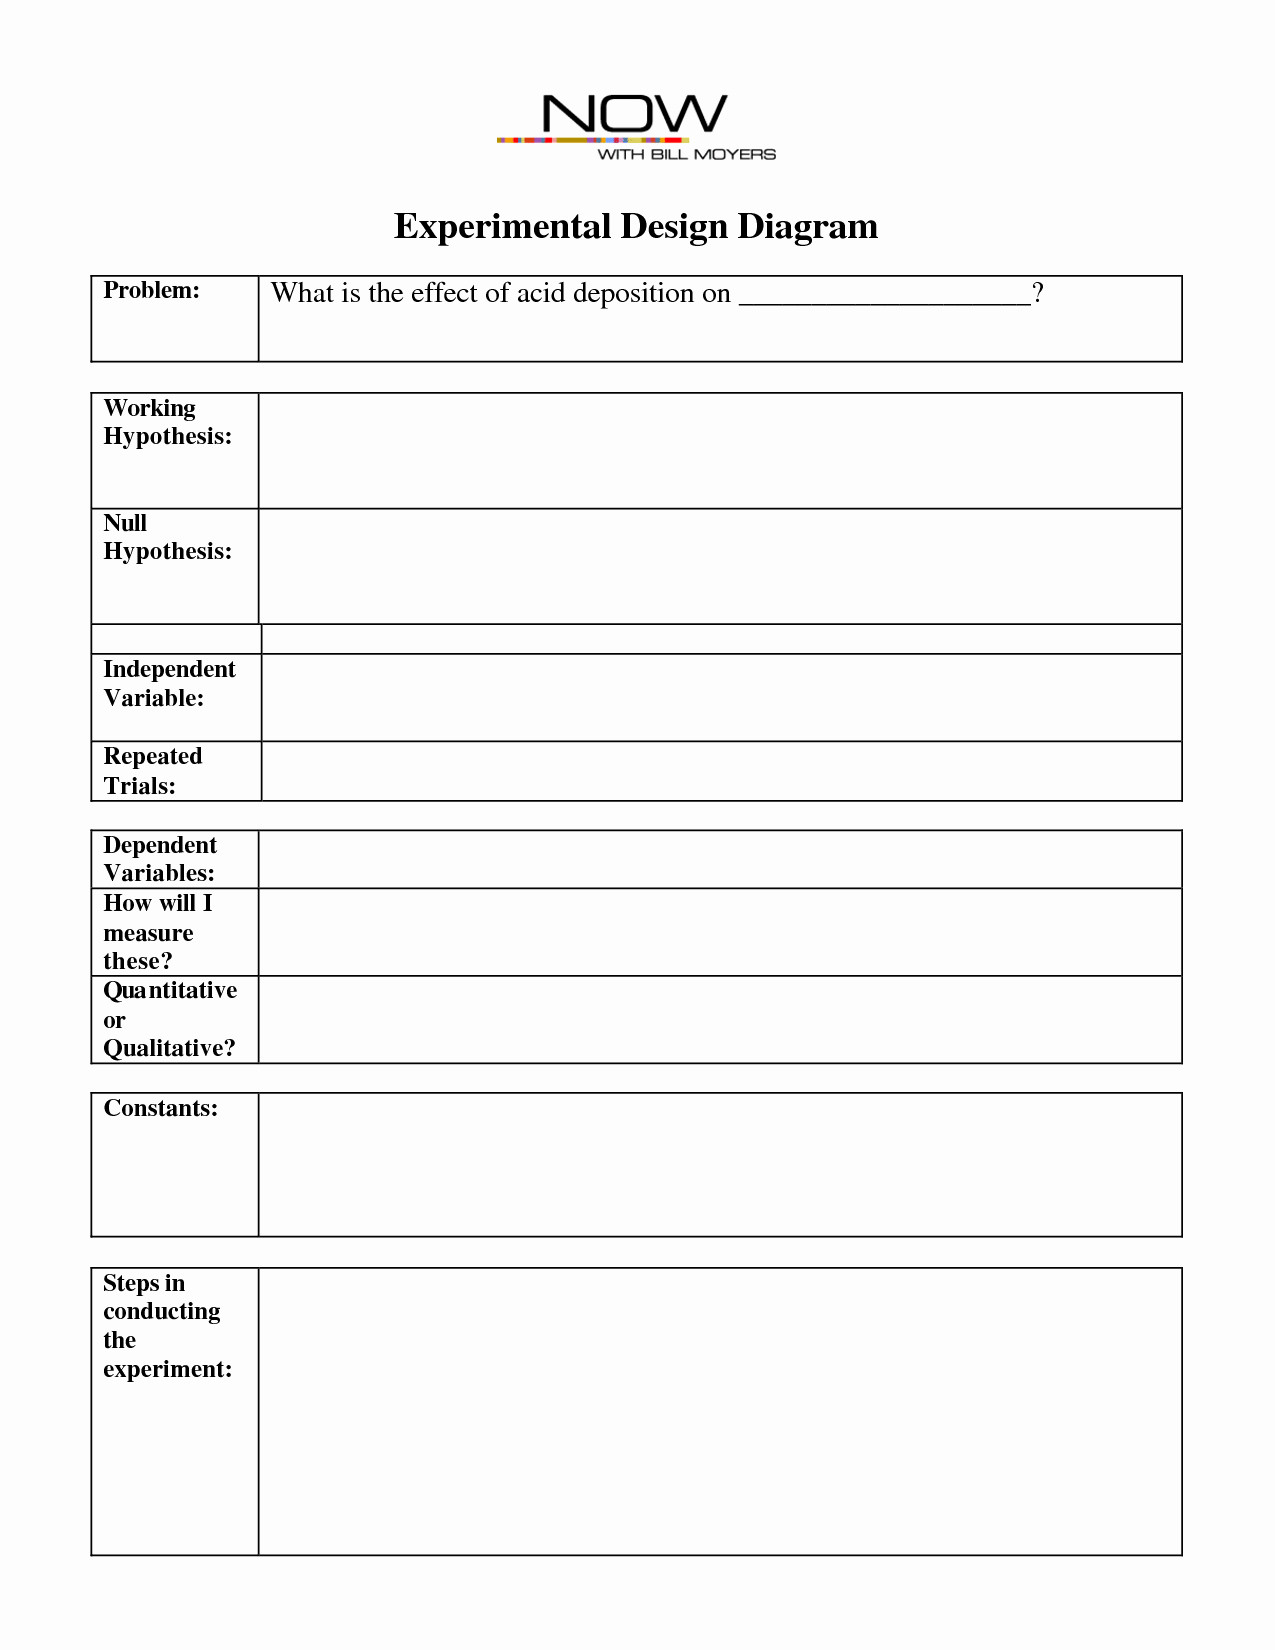 Experimental Design Worksheet Answers Experimental Design Worksheet Answers